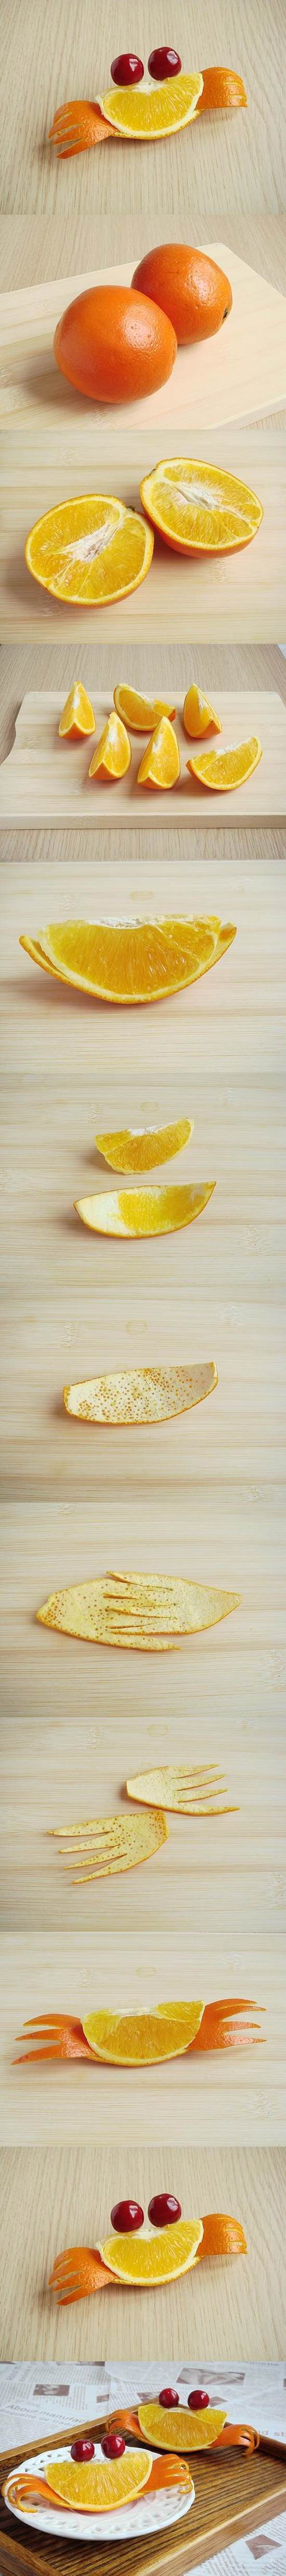 Food Art DIY - Orange Crab